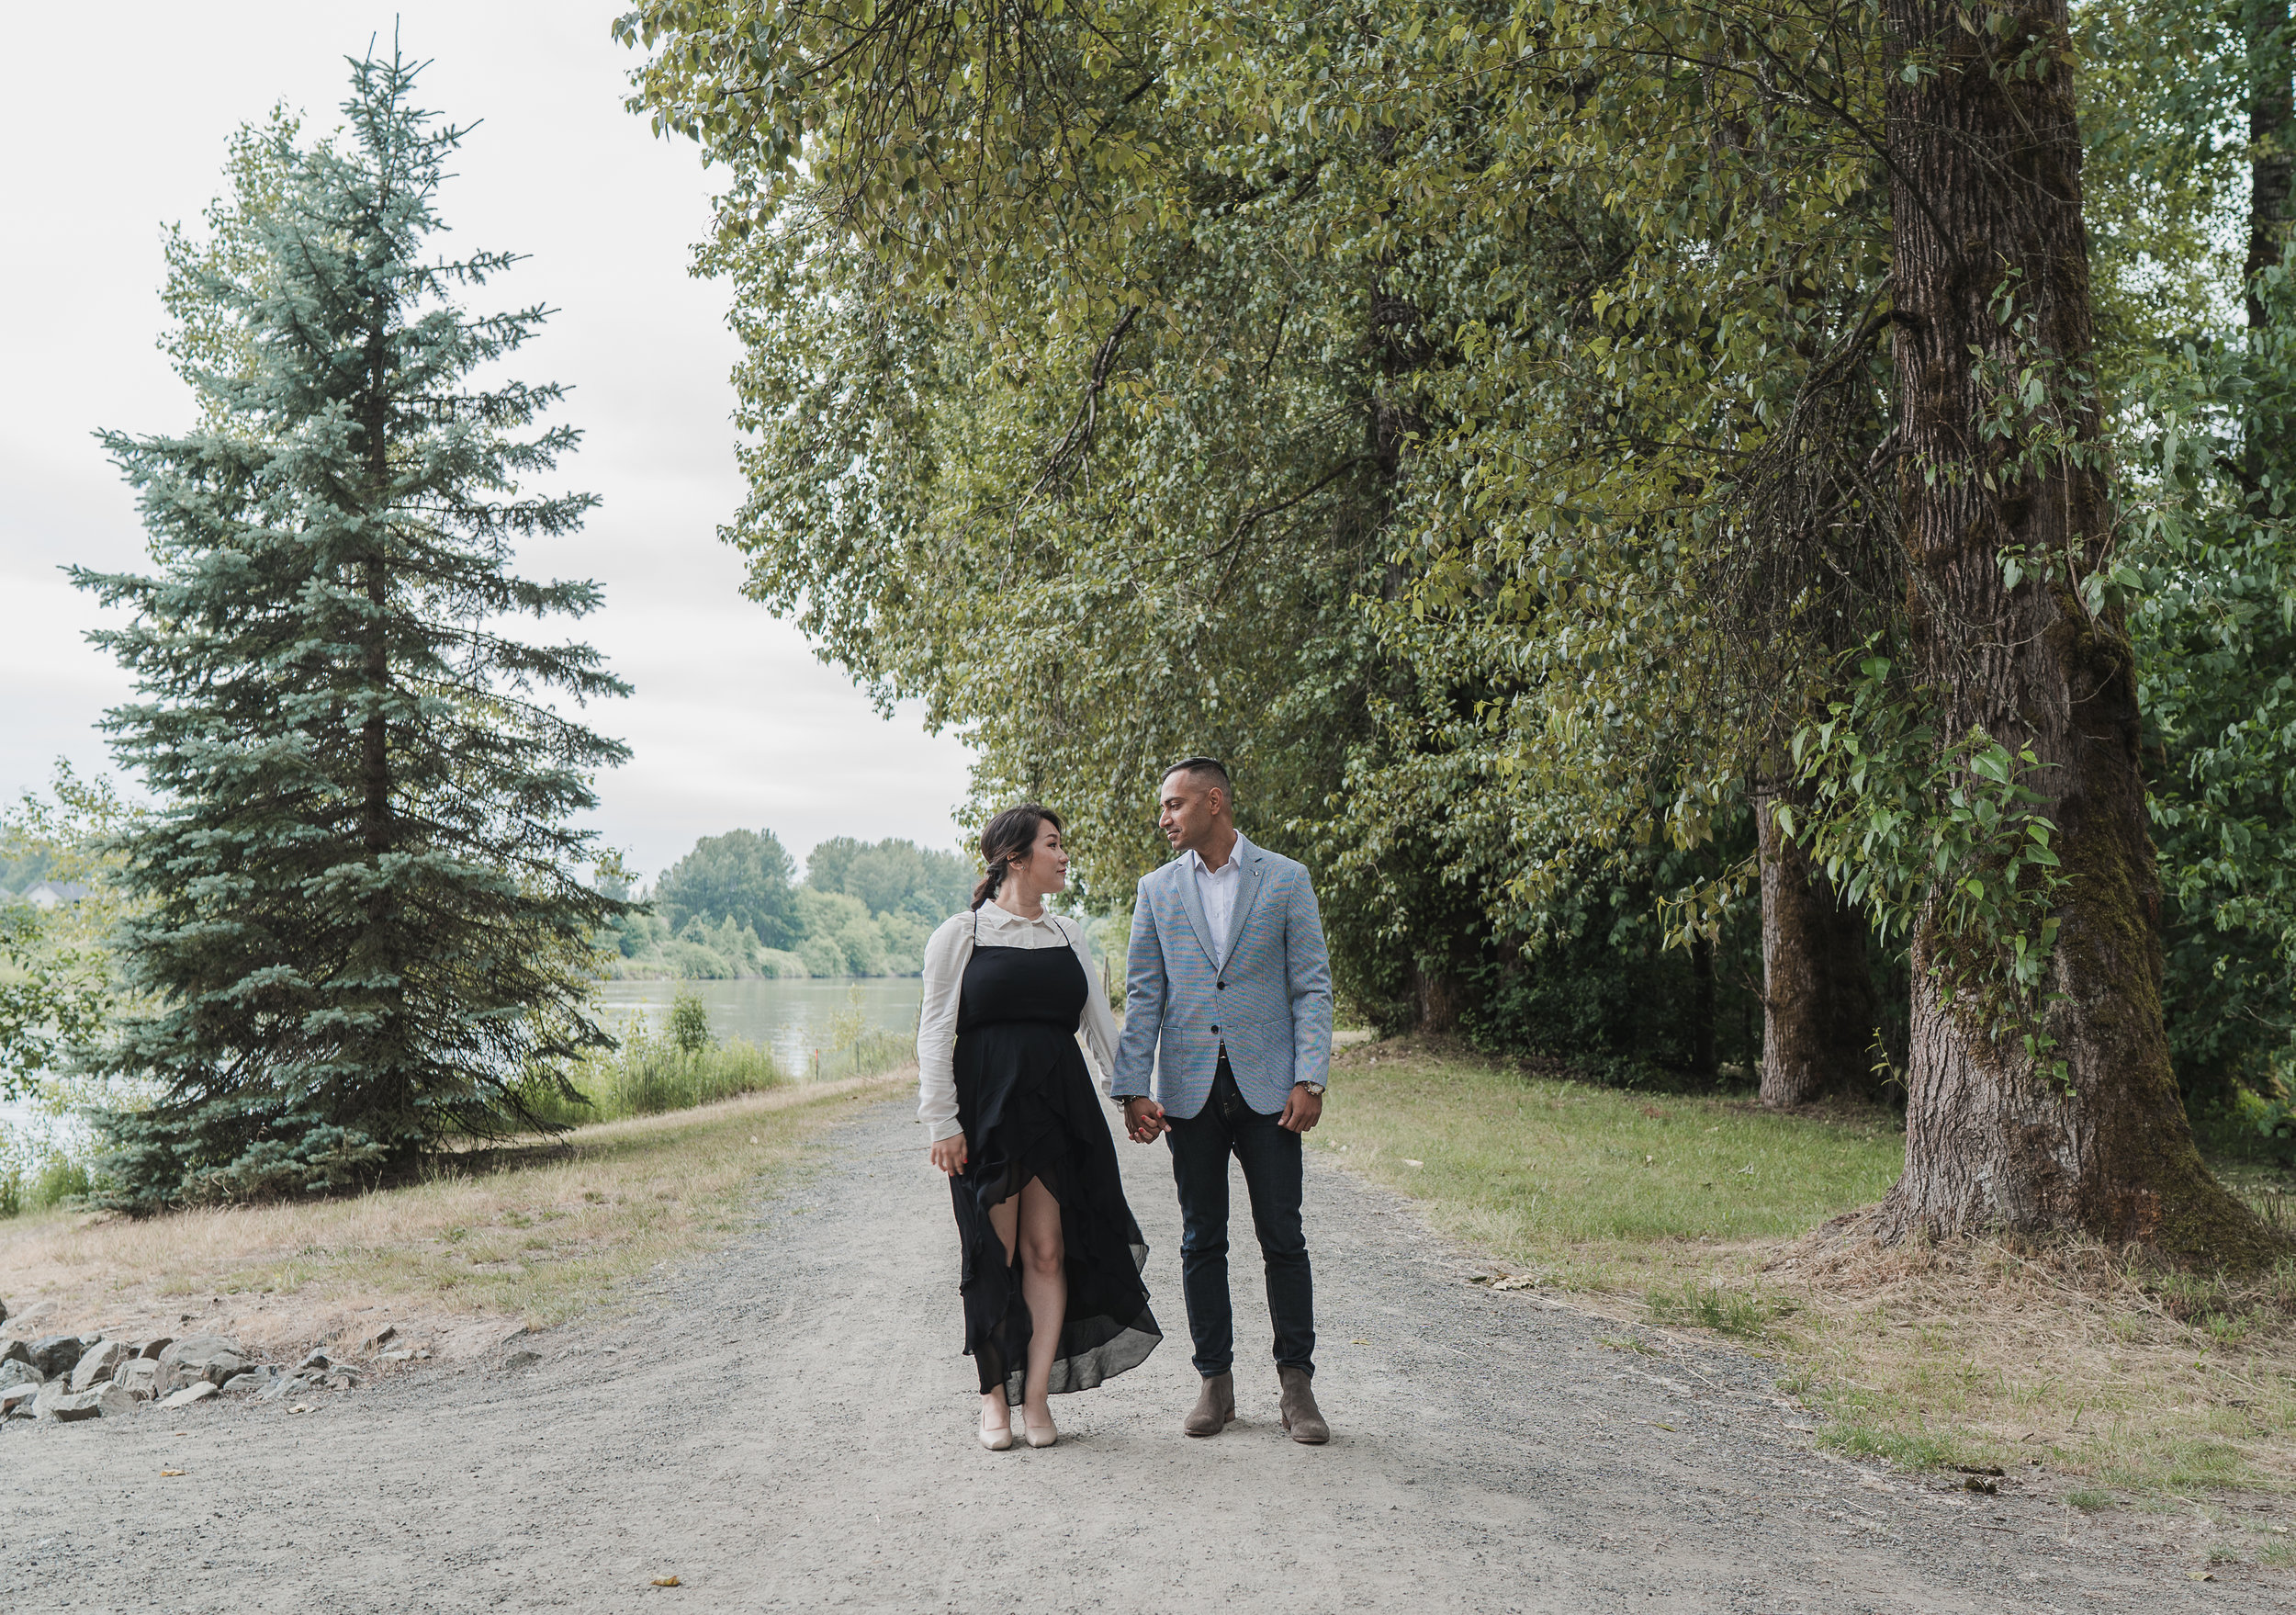 20190622 - Monika & Johnson Engagement- 0002.jpg